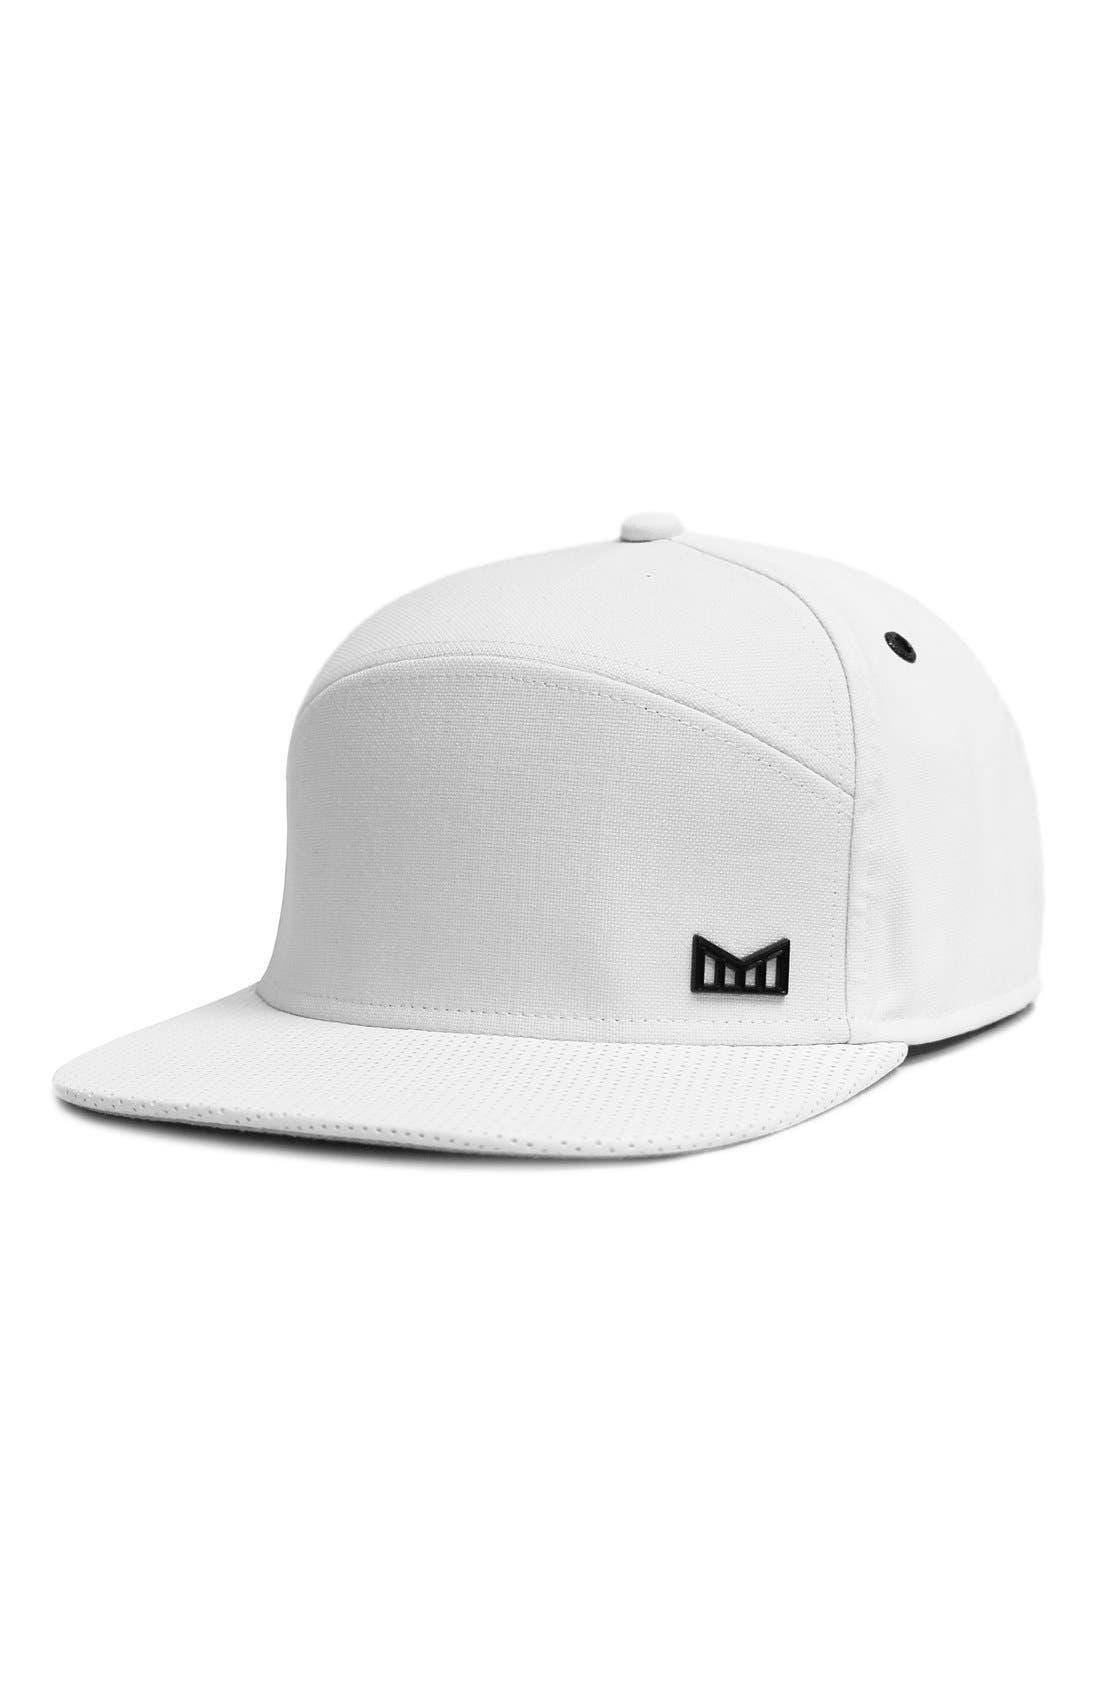 'The Vision' Horizon Fit Flat Brim Baseball Cap,                         Main,                         color, White